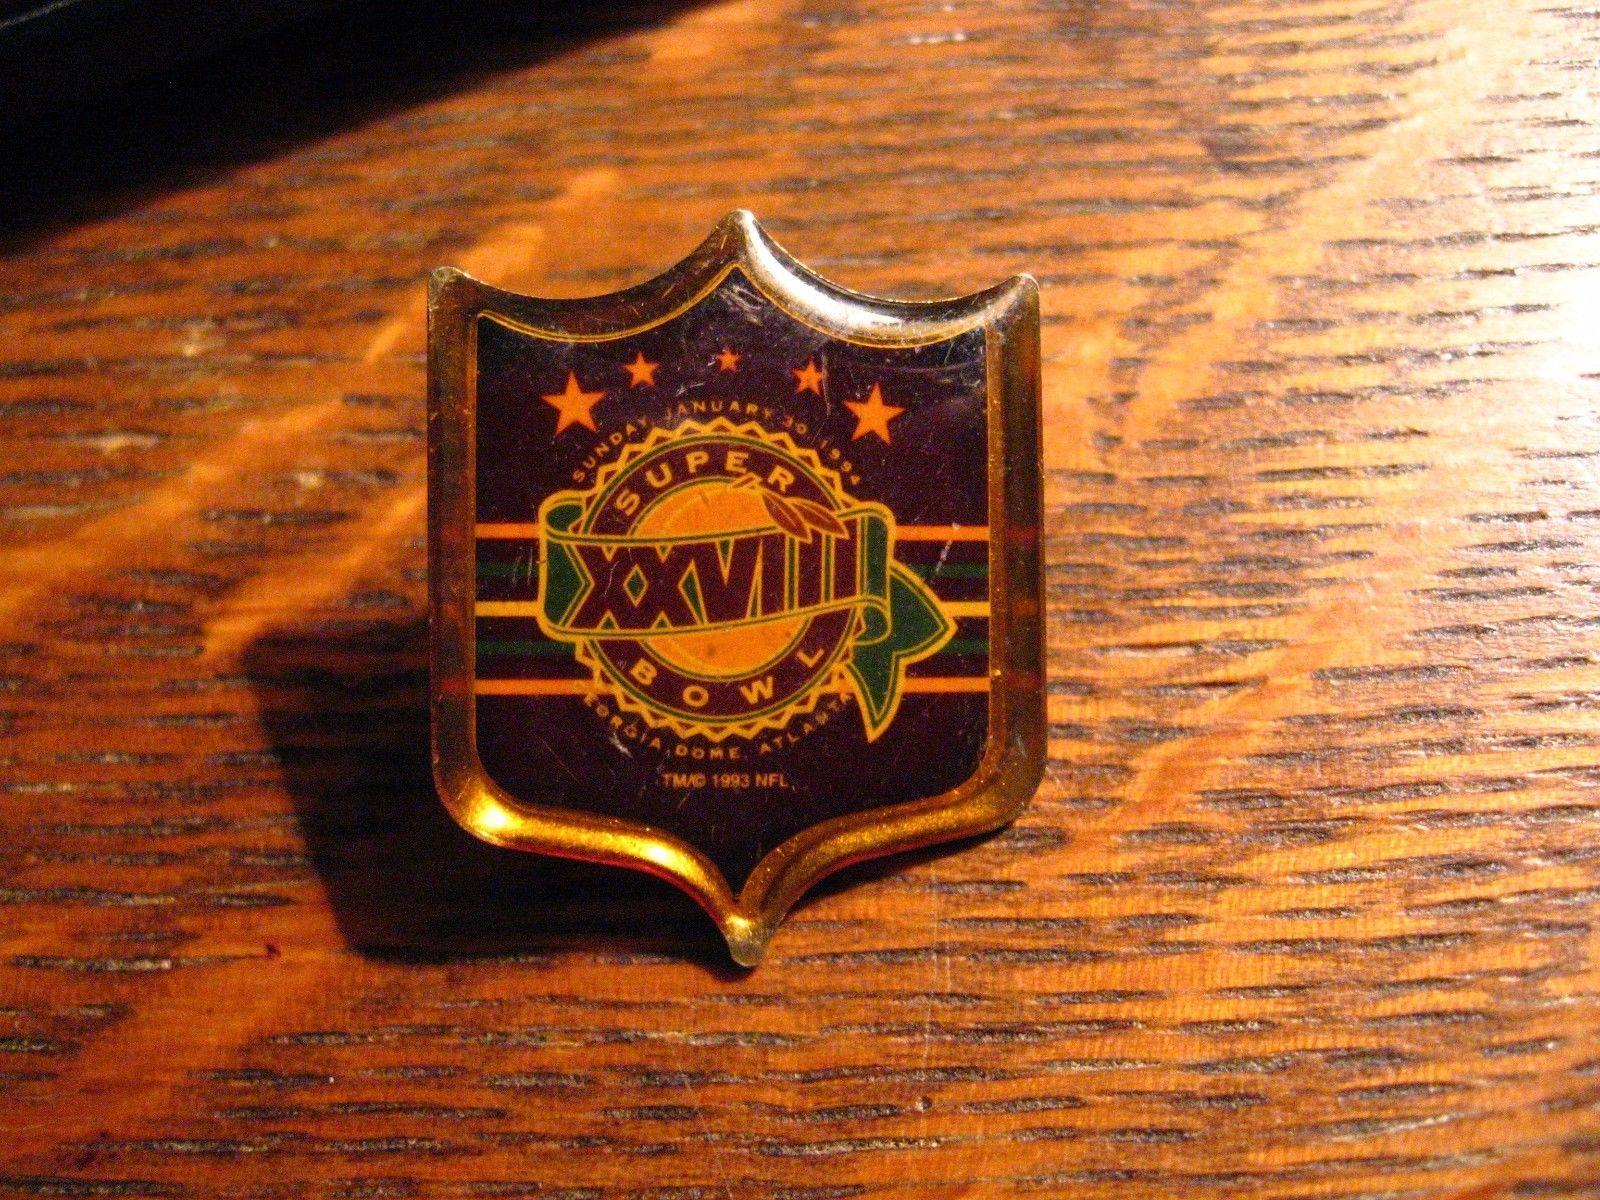 Super Bowl XXVIII Pin - Vintage 1994 Georgia Dome Atlanta Dallas Cowboys NFL Pin image 2